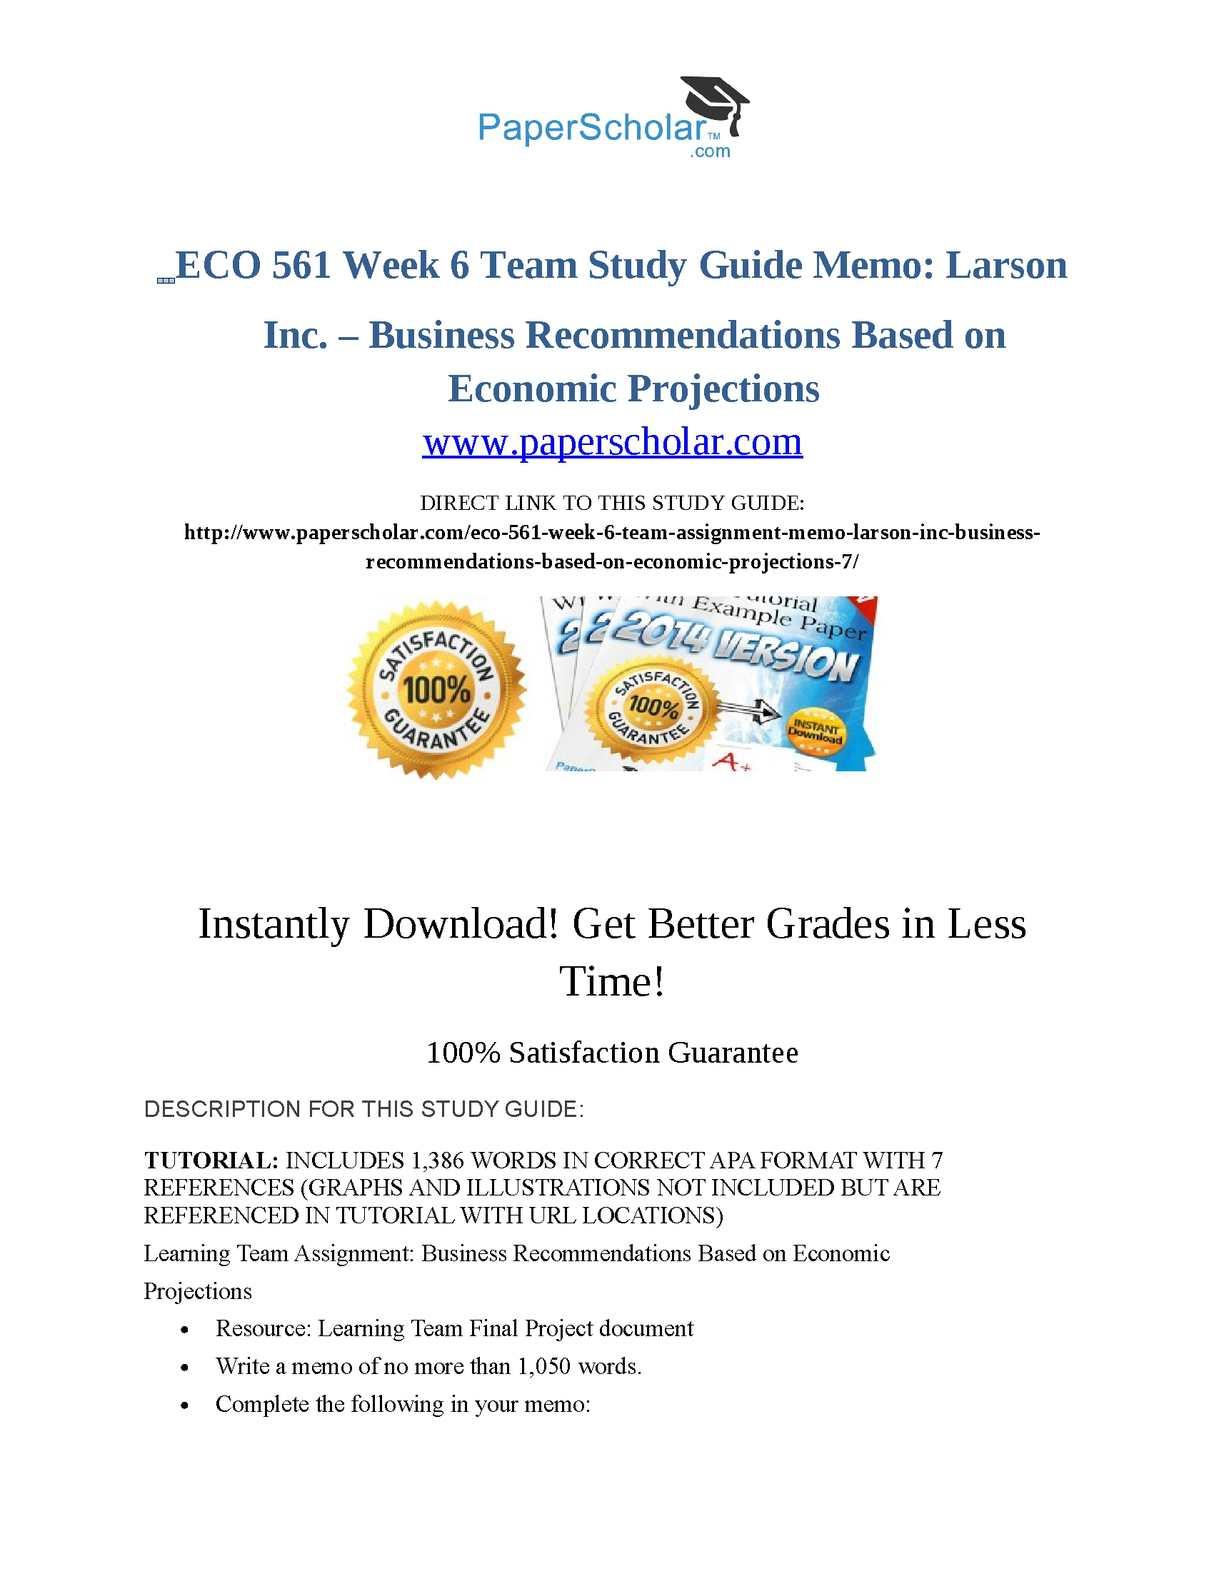 eco 561 week 6  week 6: final business proposal john a acosta eco/ 561 april 23, 2014 dan olsen week 6: final business proposal introduction thomas money service i.